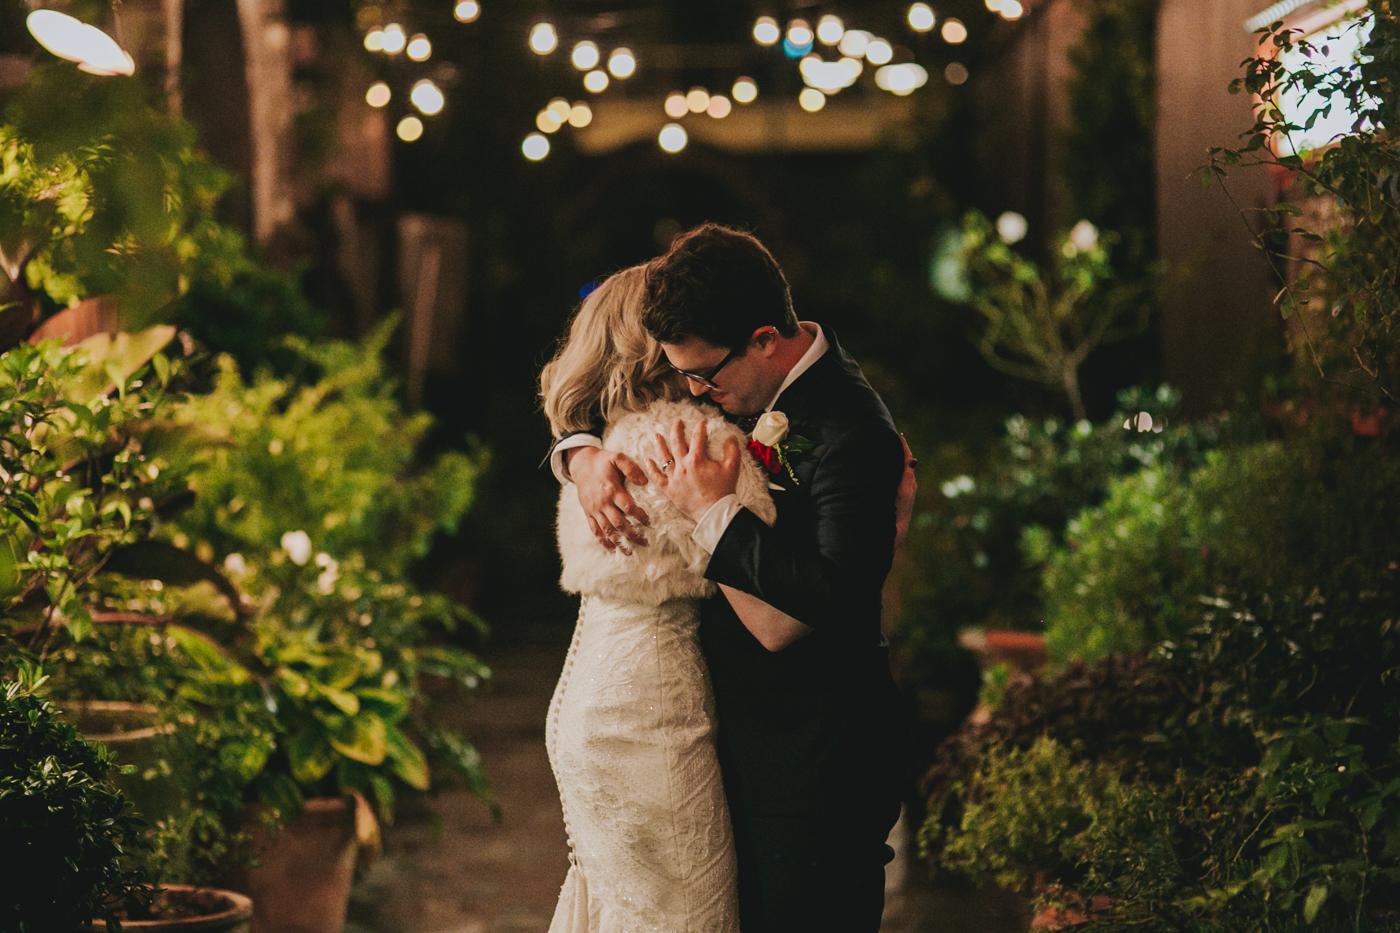 Jo & Tom Wedding - The Grounds of Alexandria - Samantha Heather Photography-327.jpg